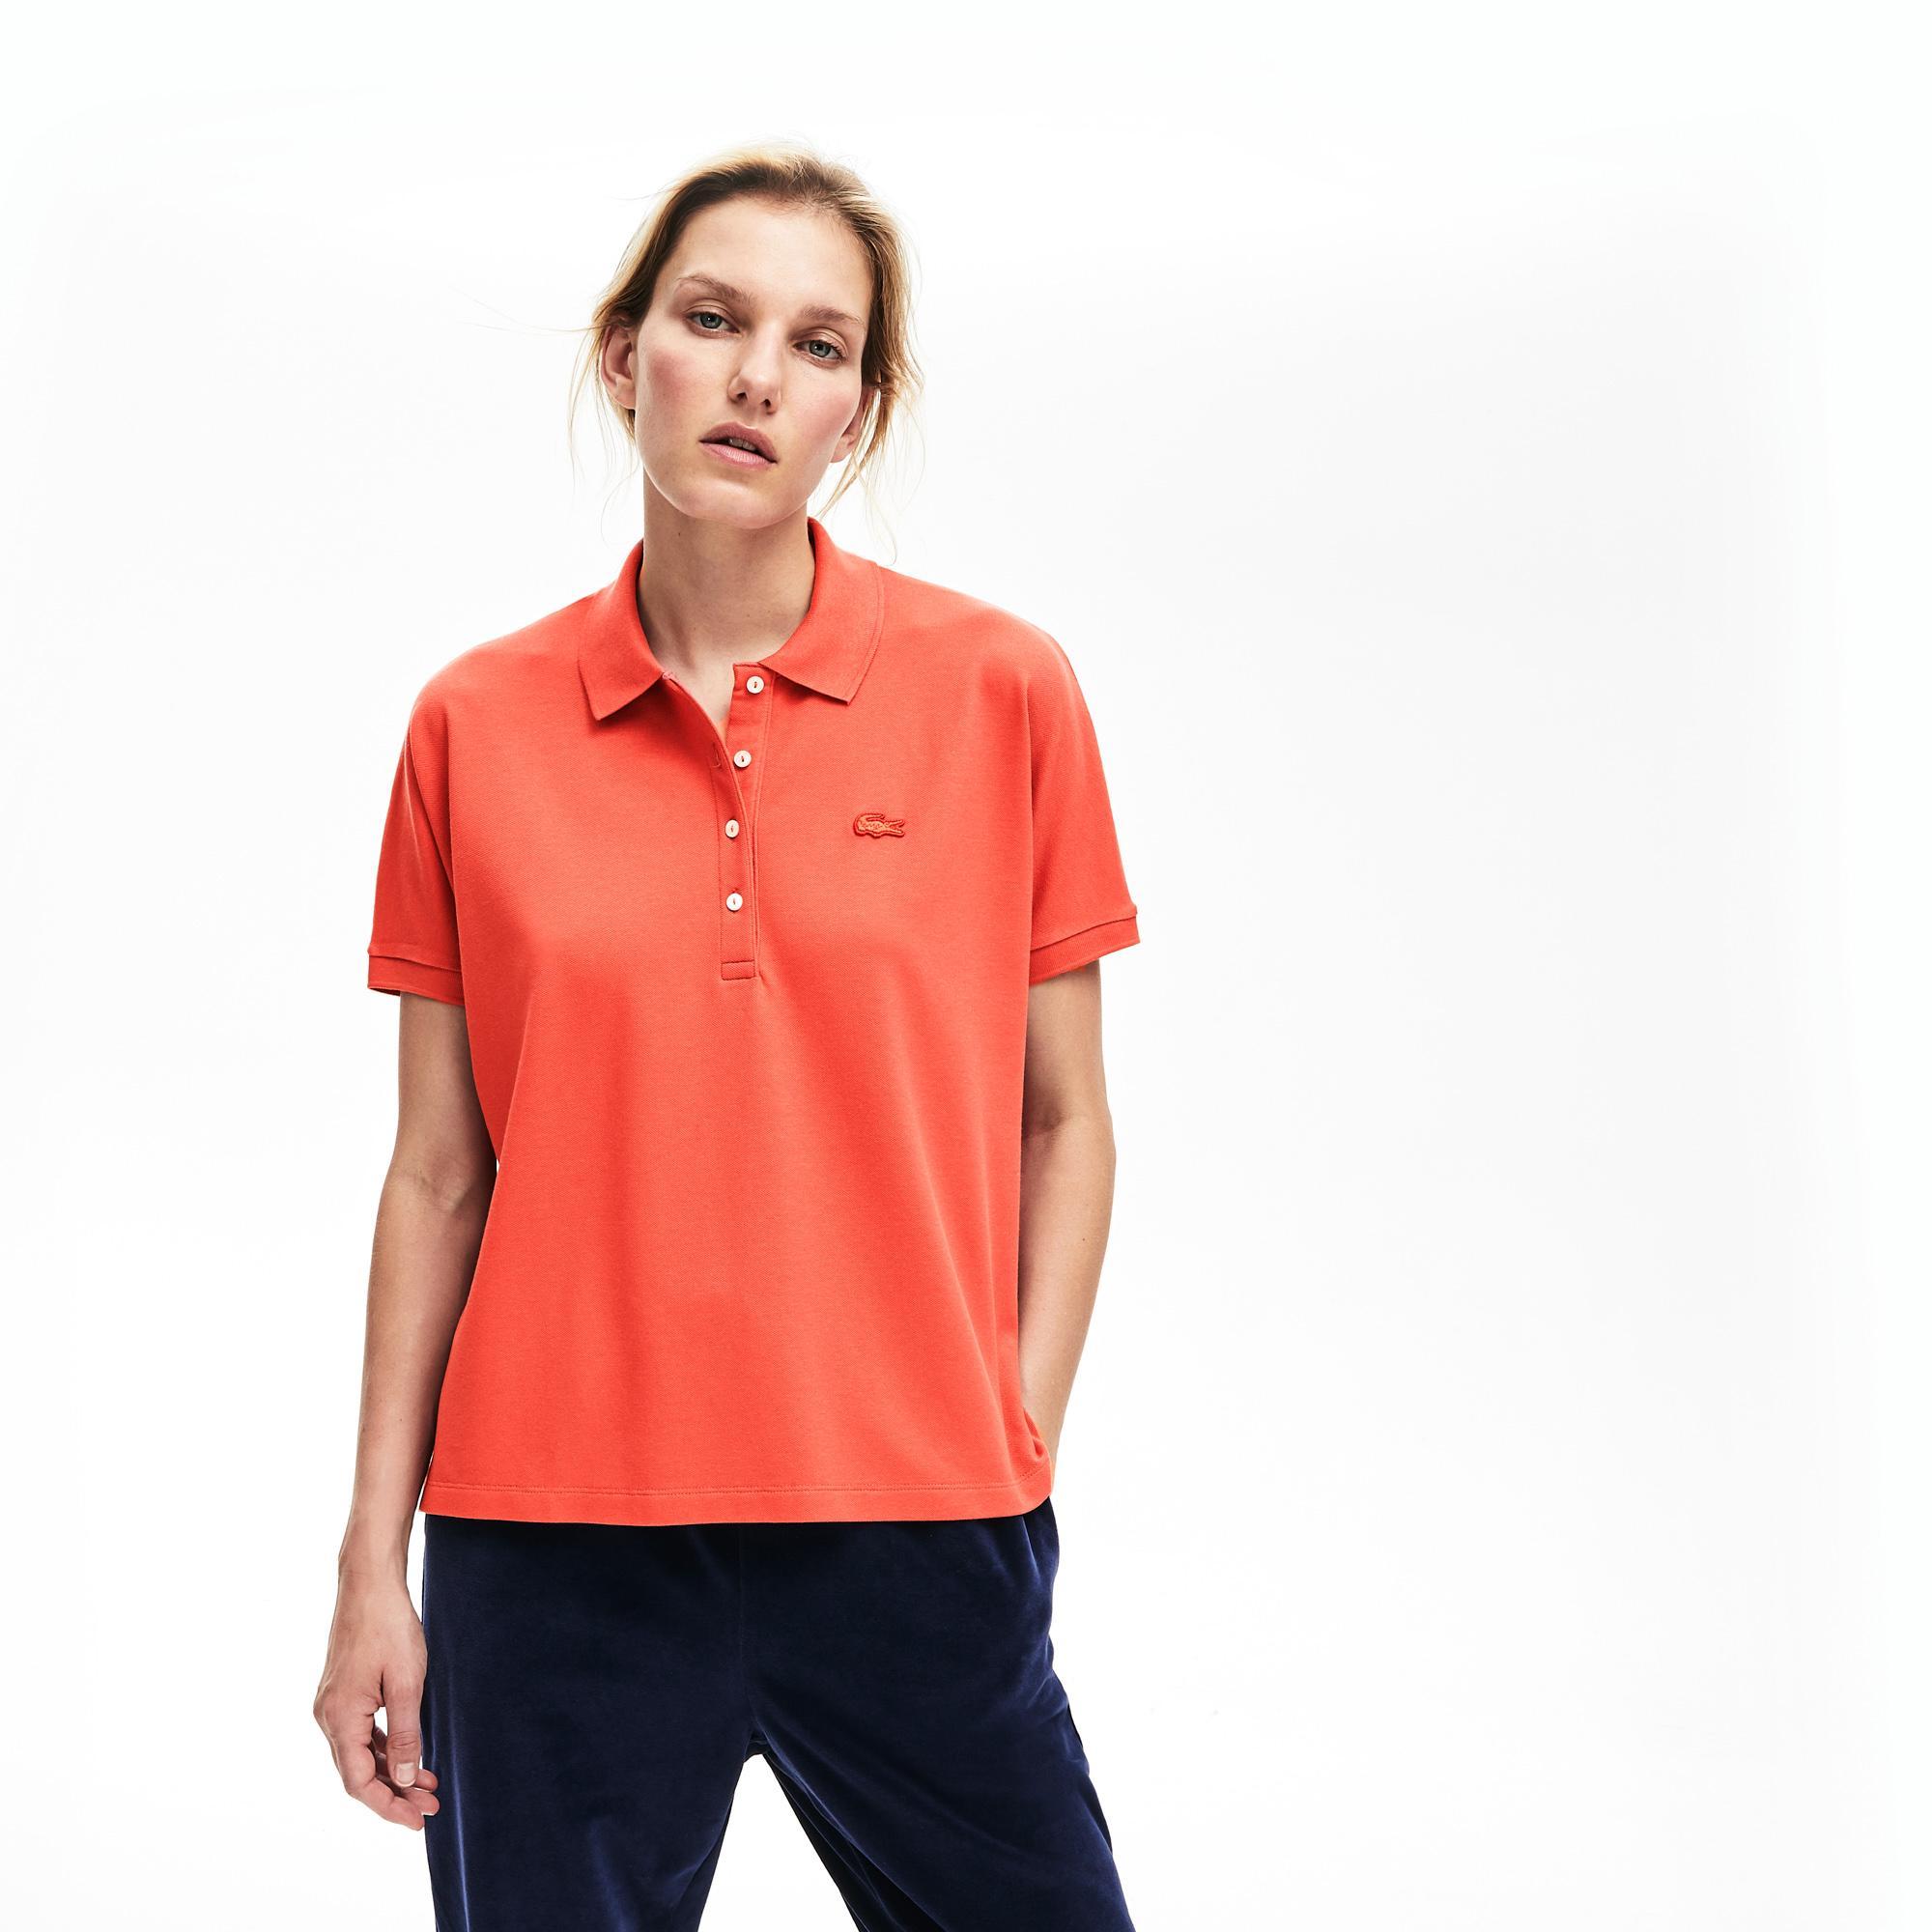 Lacoste Women's Relax Fit Flowing Stretch Cotton Piqué Soft Polo